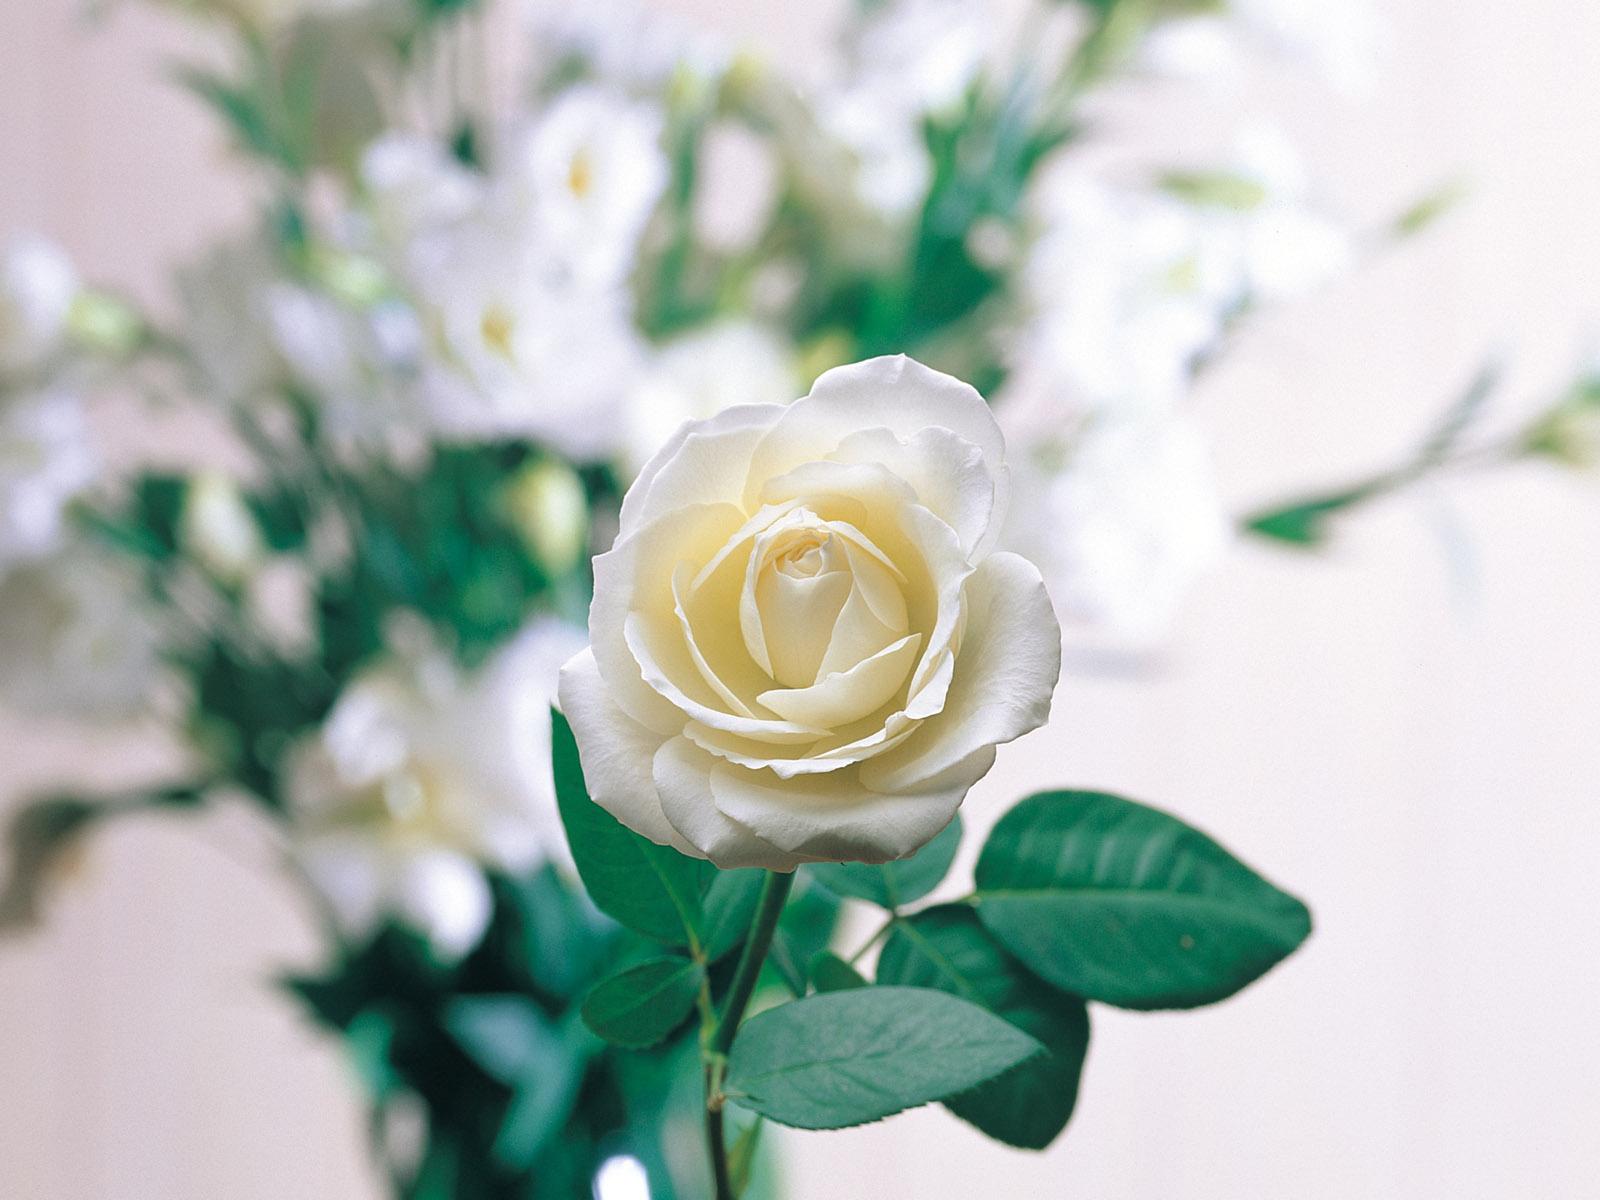 Rose Wallpaper: White Rose Wallpaper HD